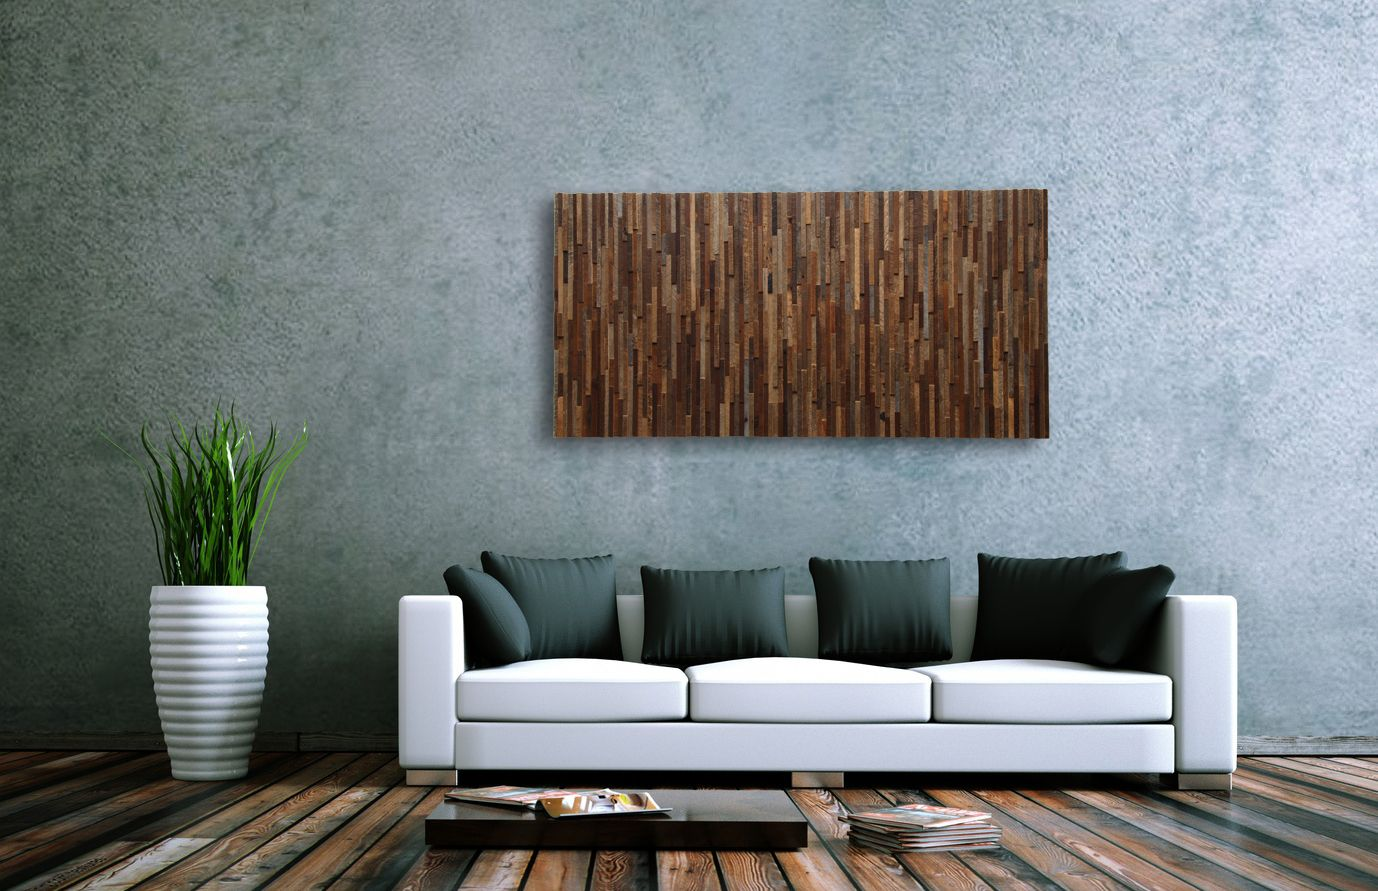 Custom Wood Wall Decor : Custom reclaimed wood wall art by carpentercraig